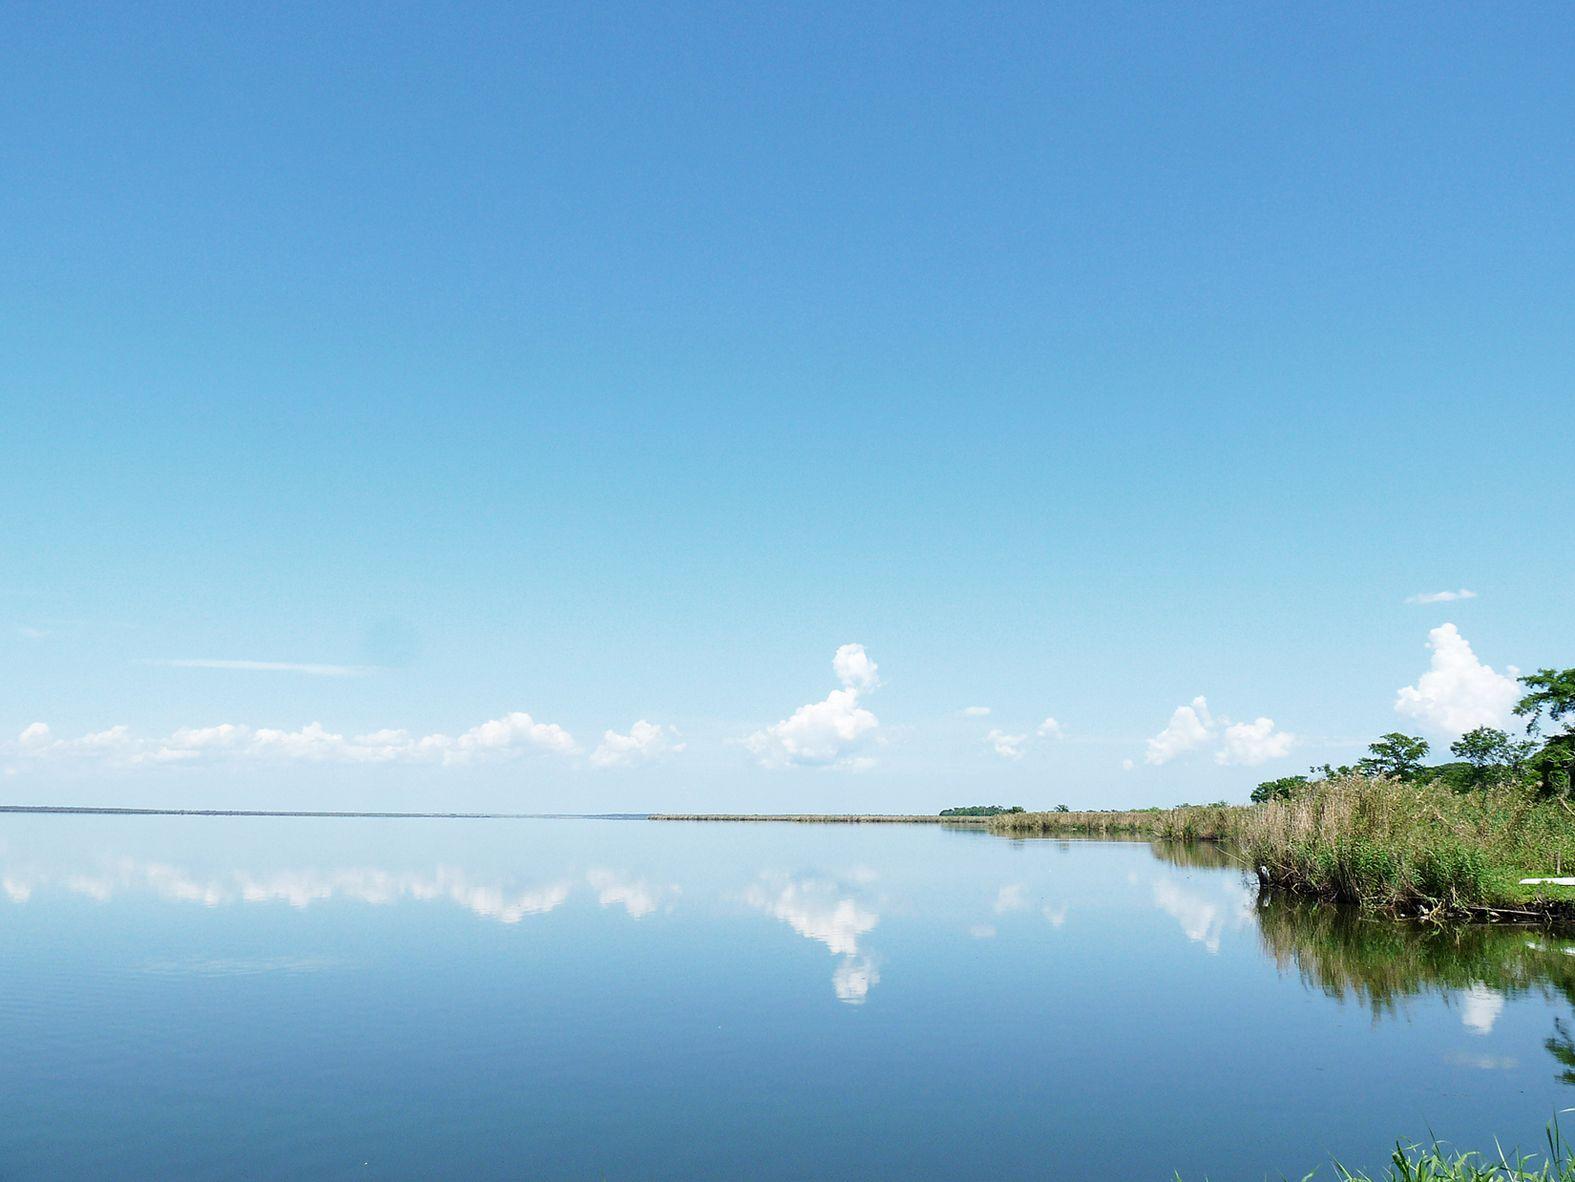 Enjoying the scenery of Lake Jesup at the Black Hammock